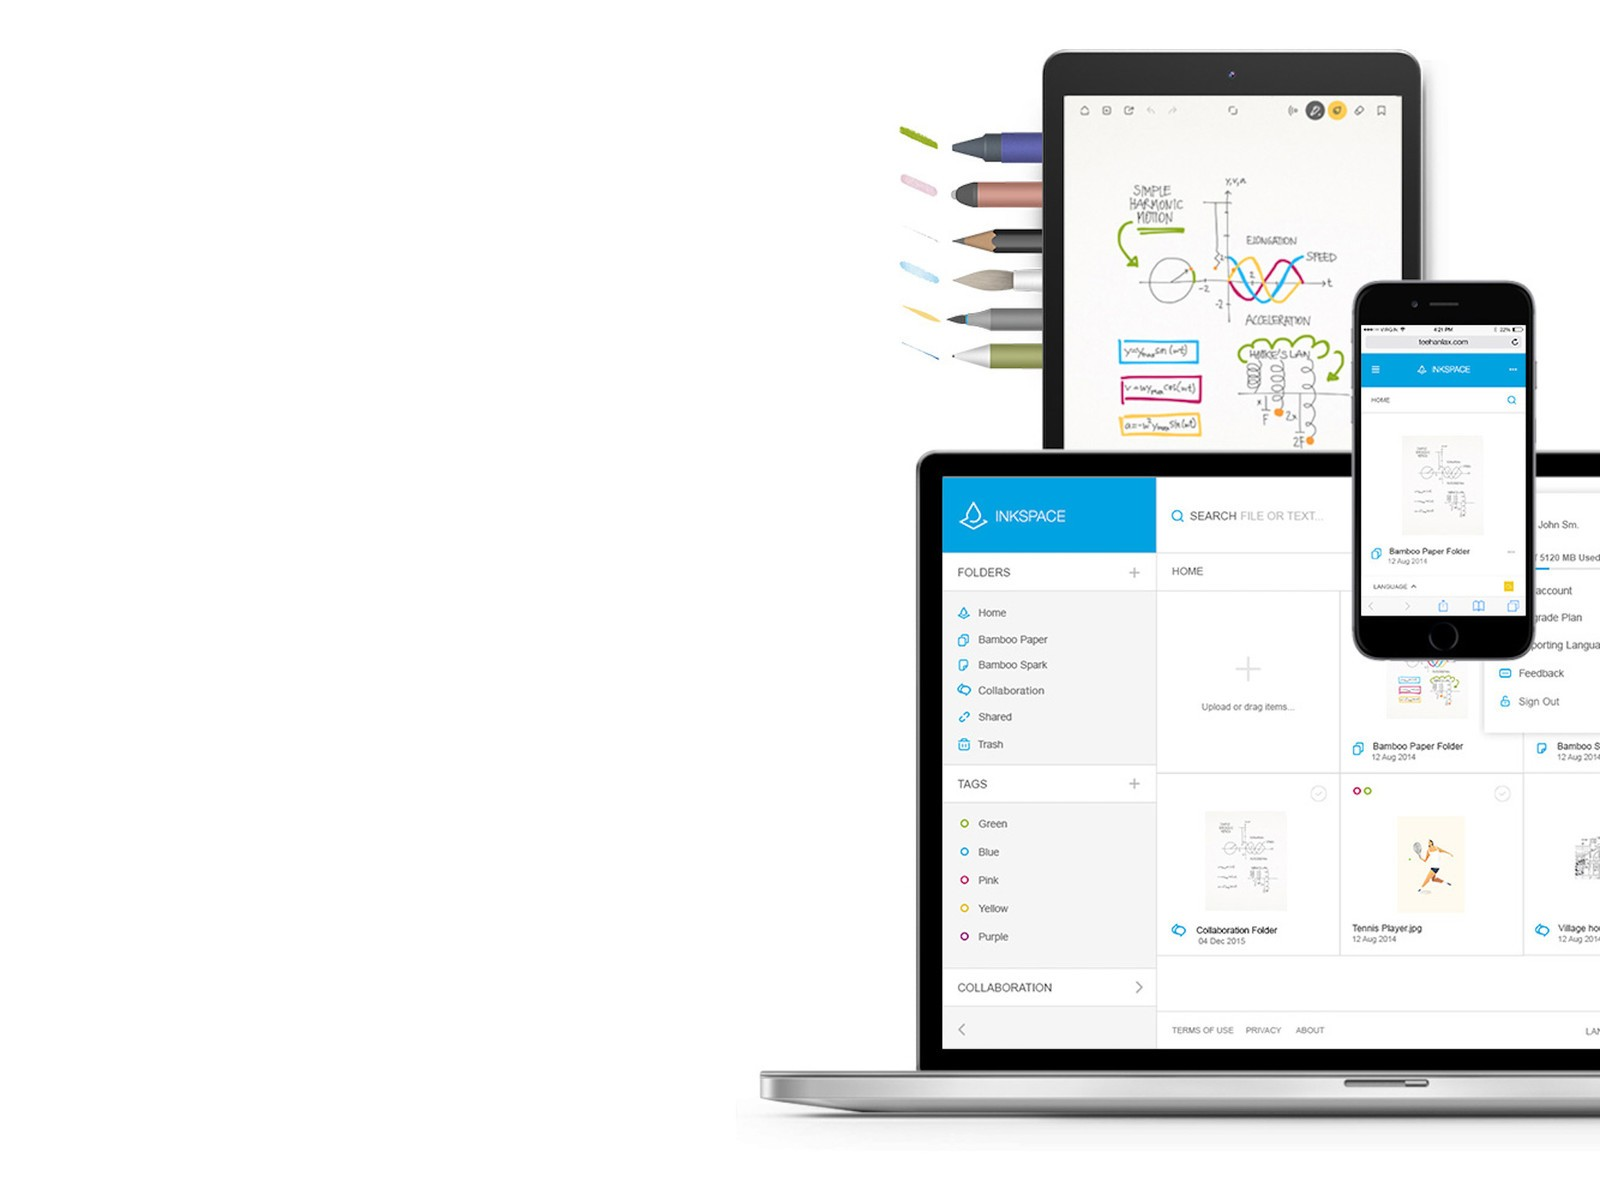 1600x1200 wacom enters the ipad stylus market